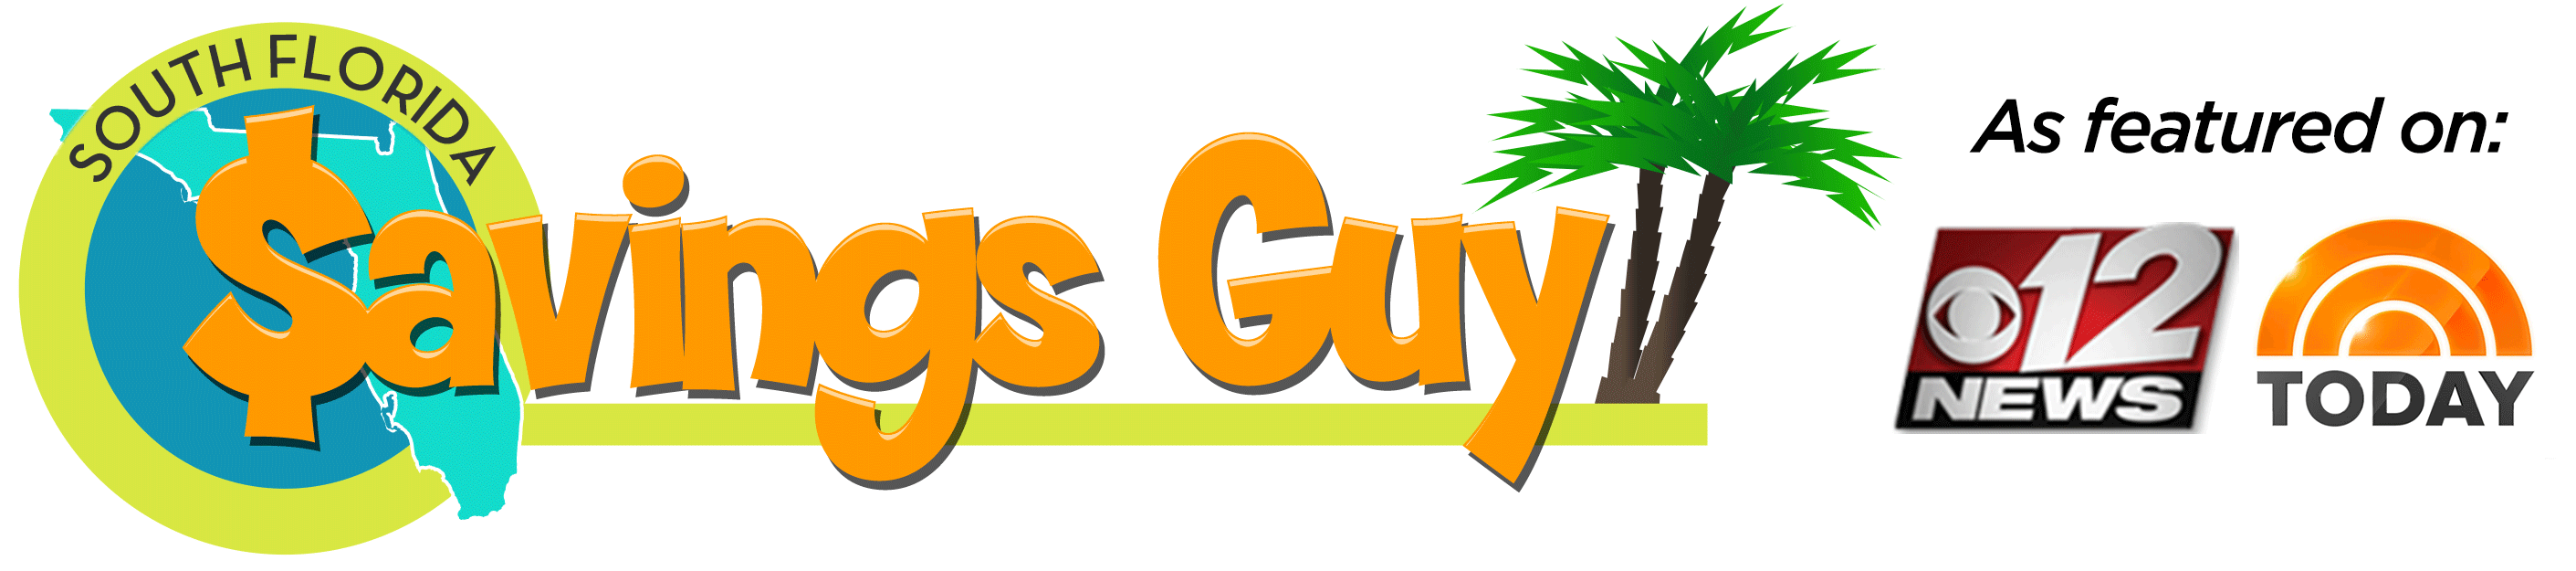 South Florida Savings Guy